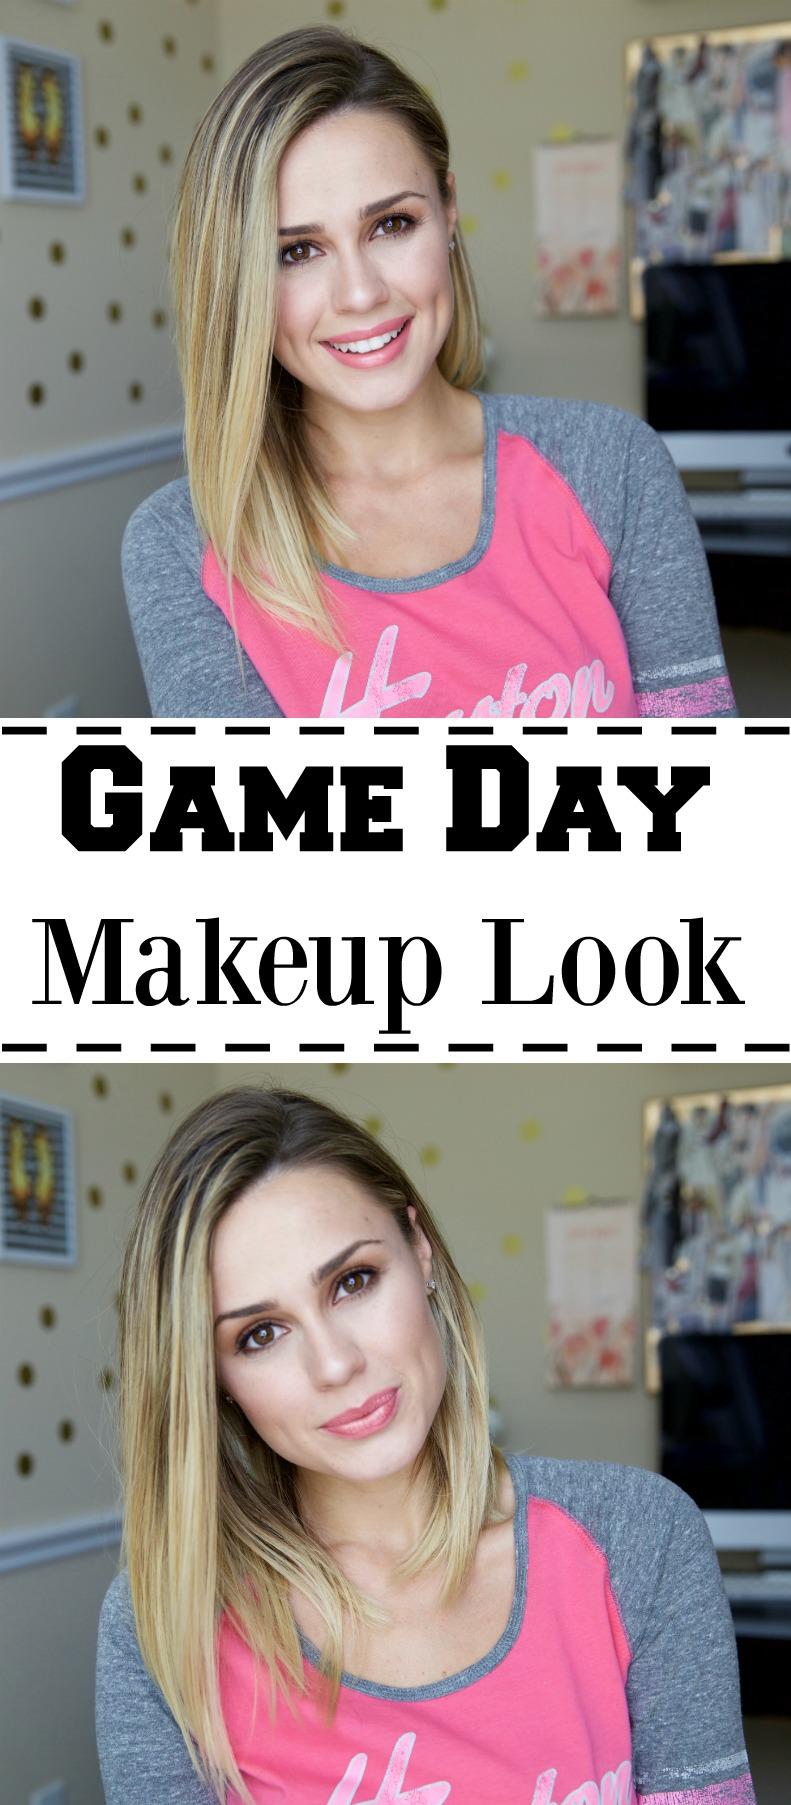 Game Day Makeup look | Drugstore Makeup Look | Drugstore Tutorial | Uptown with Elly Brown